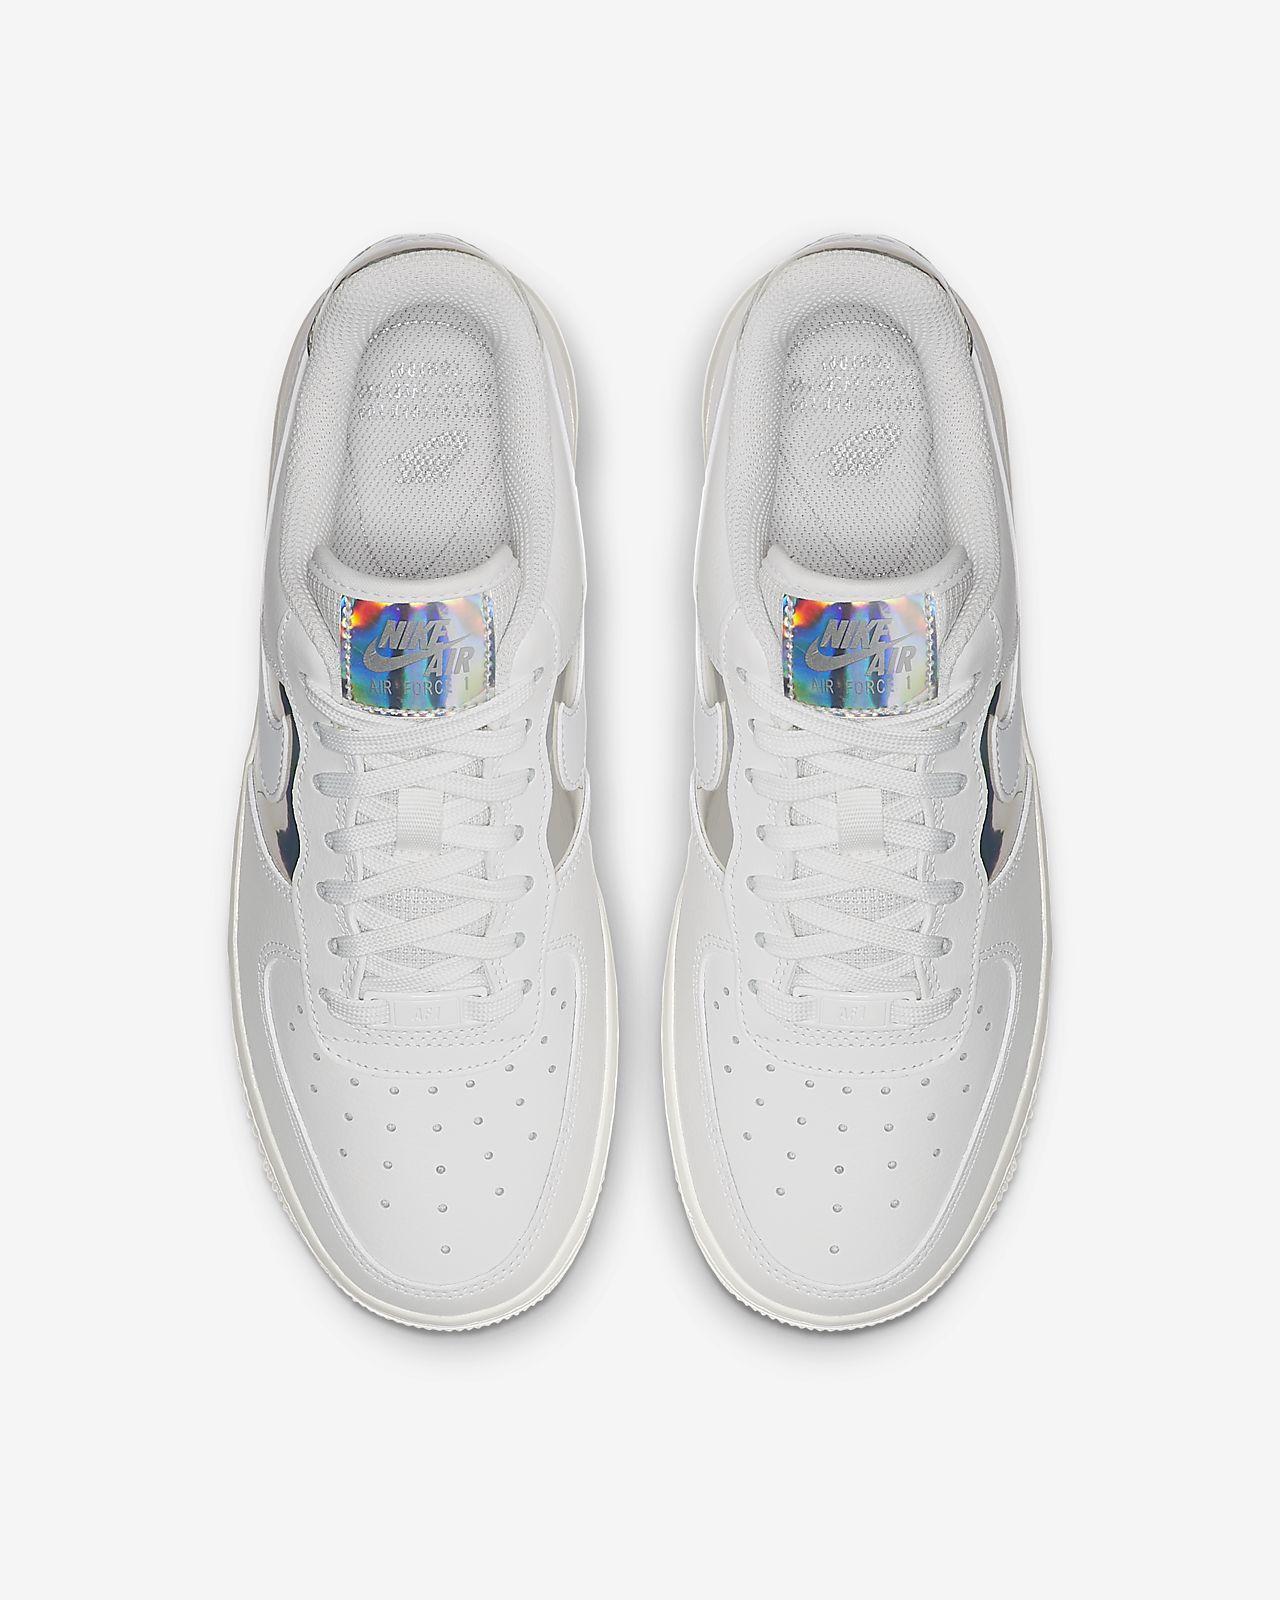 Nike Air Force 1 Low Iridescent Womens CJ9704 100